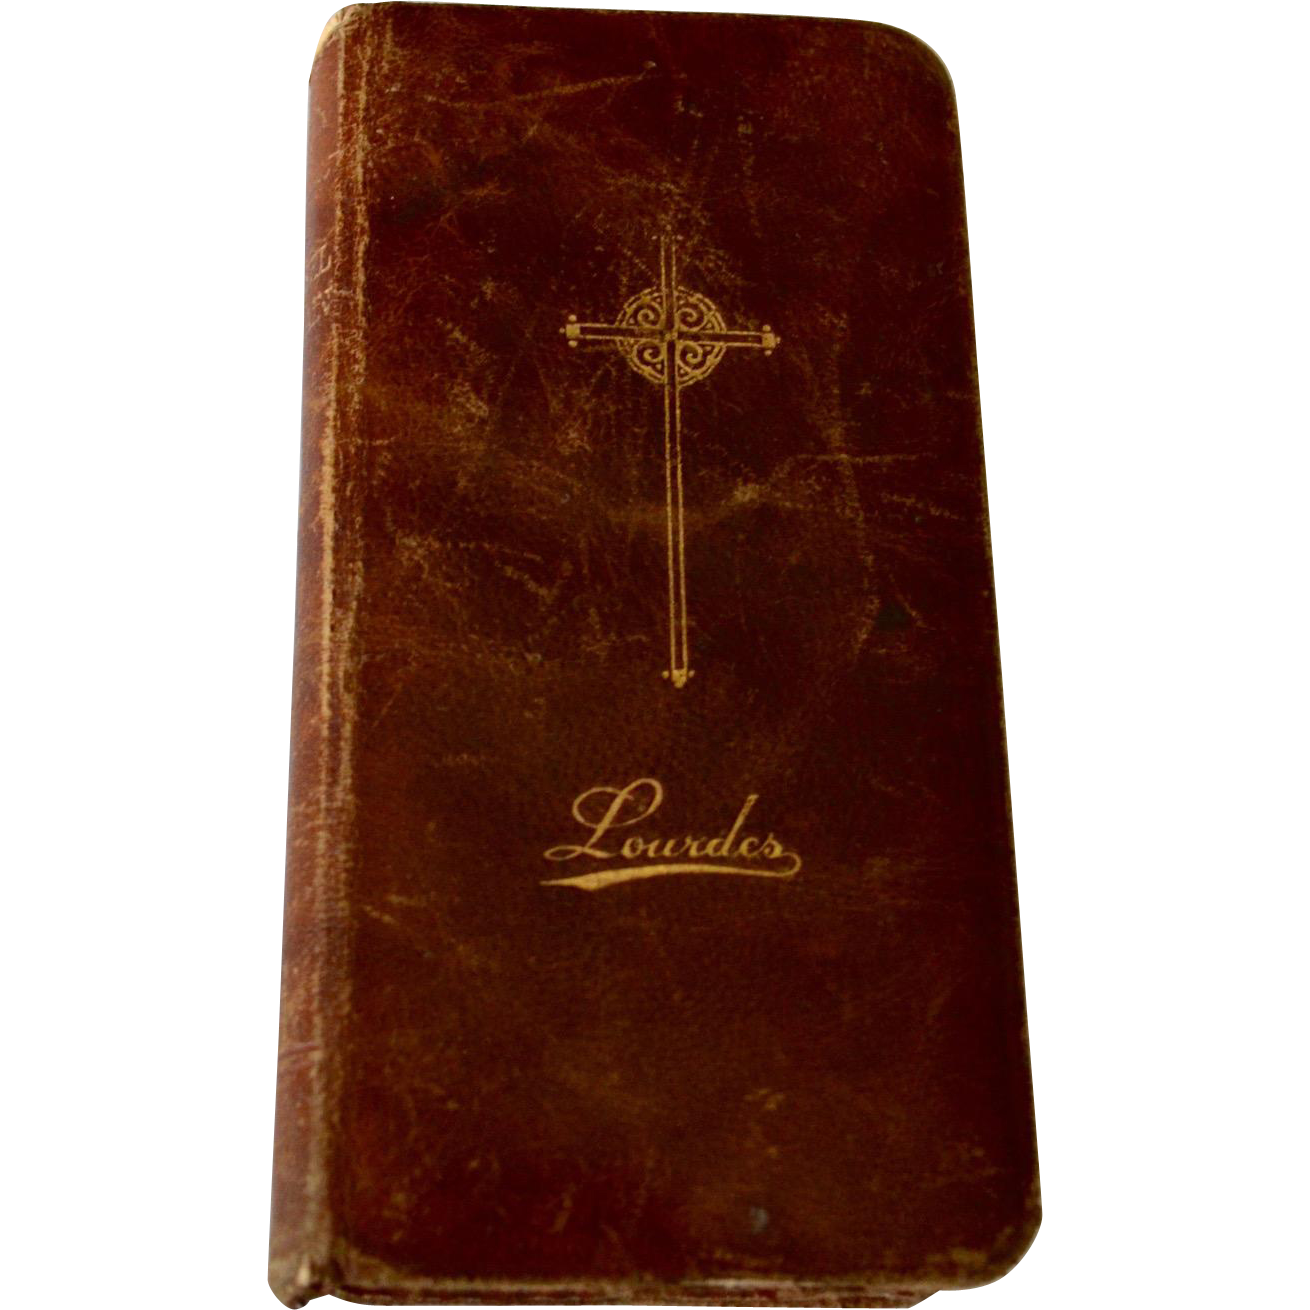 Antique Lourdes France Roman Catholic Missel 1902 Leather Binding